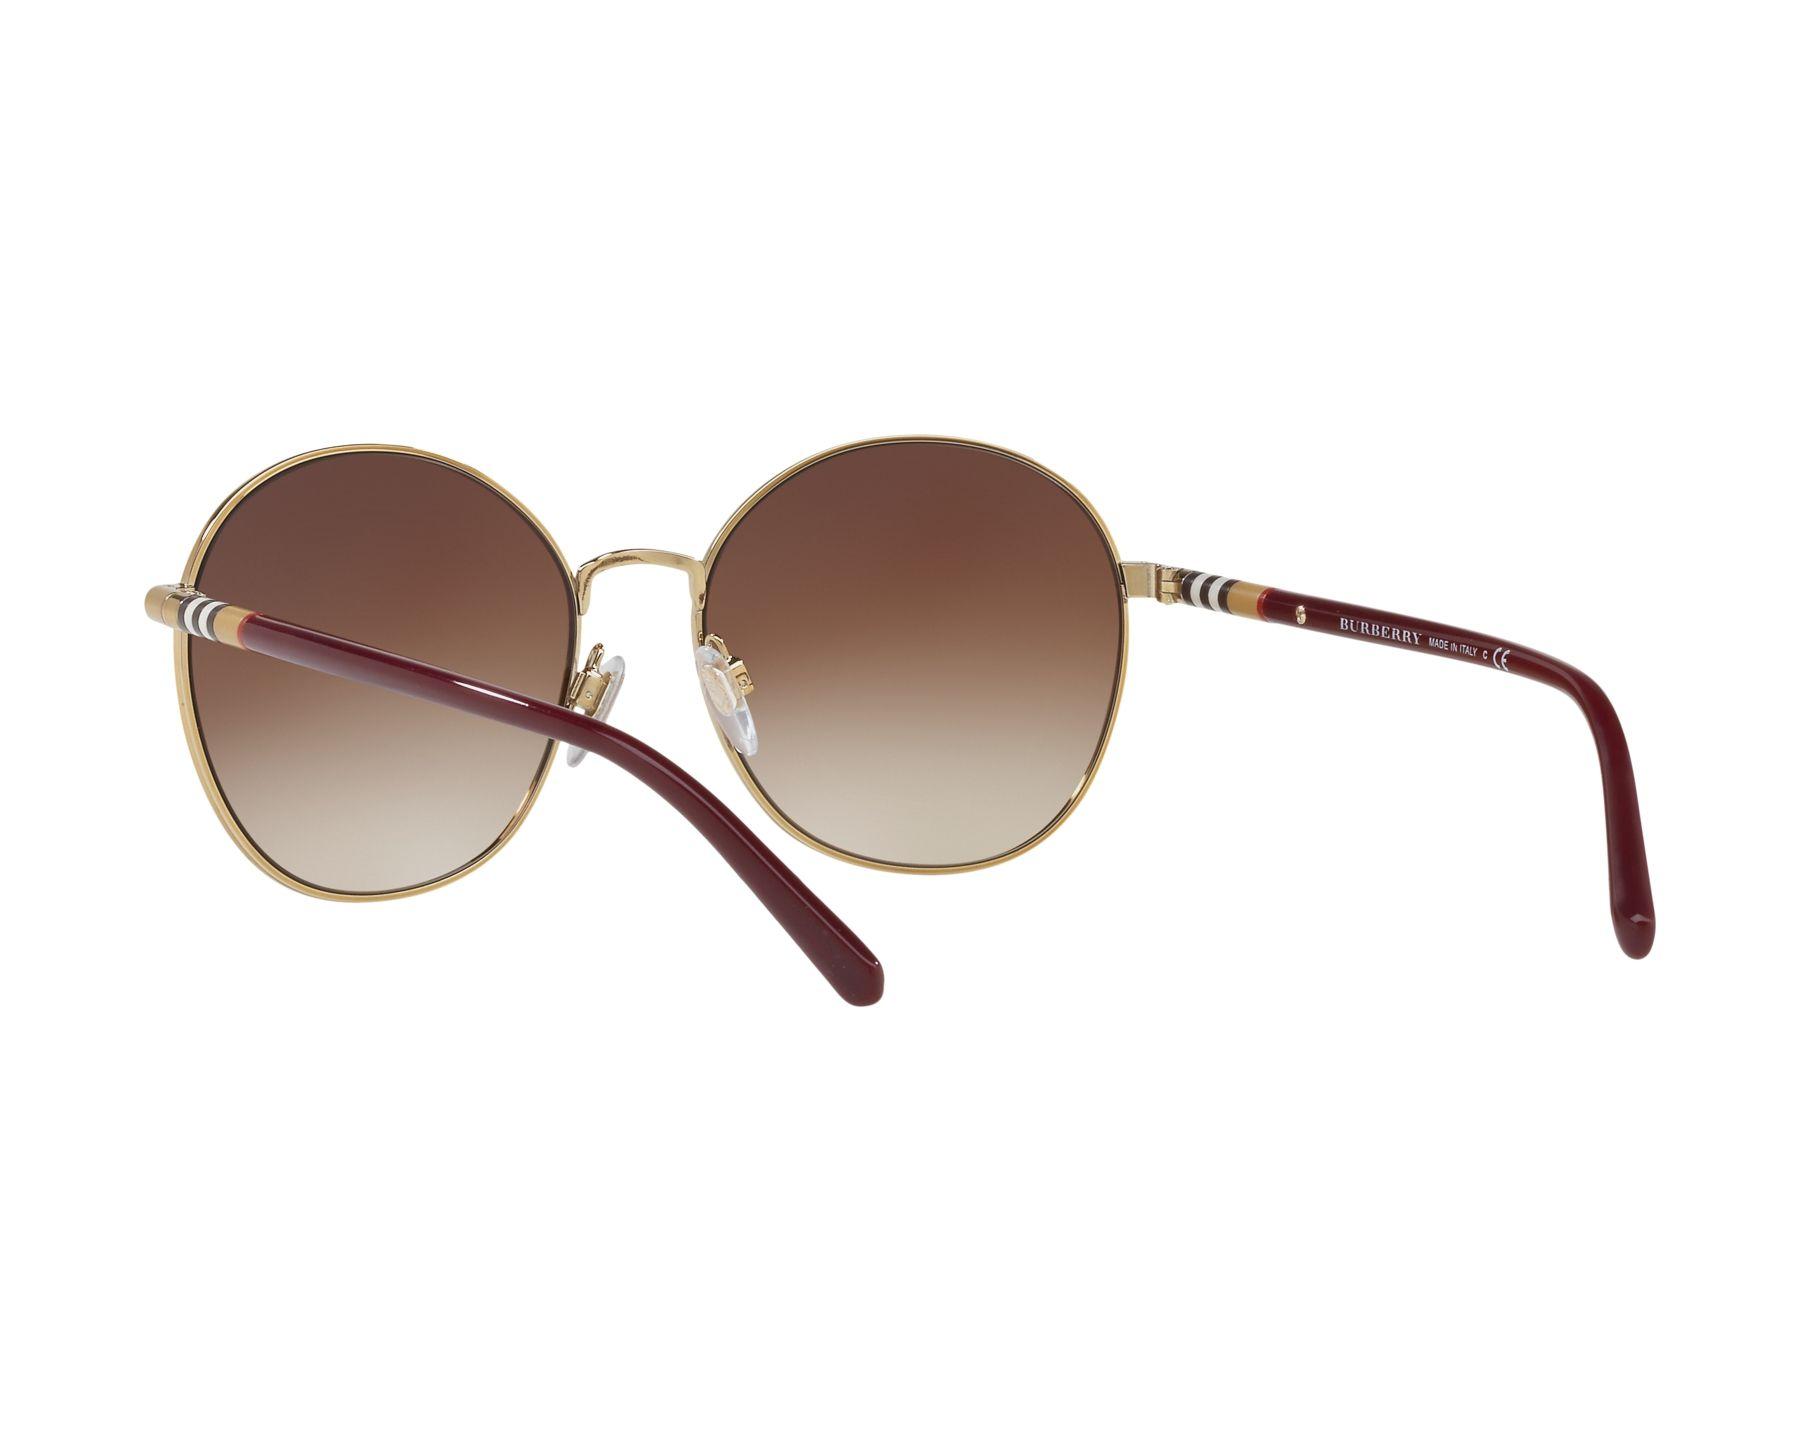 5c8b85f04c0 Sunglasses Burberry BE-3094 125613 56-17 Bordeaux Gold 360 degree view 6